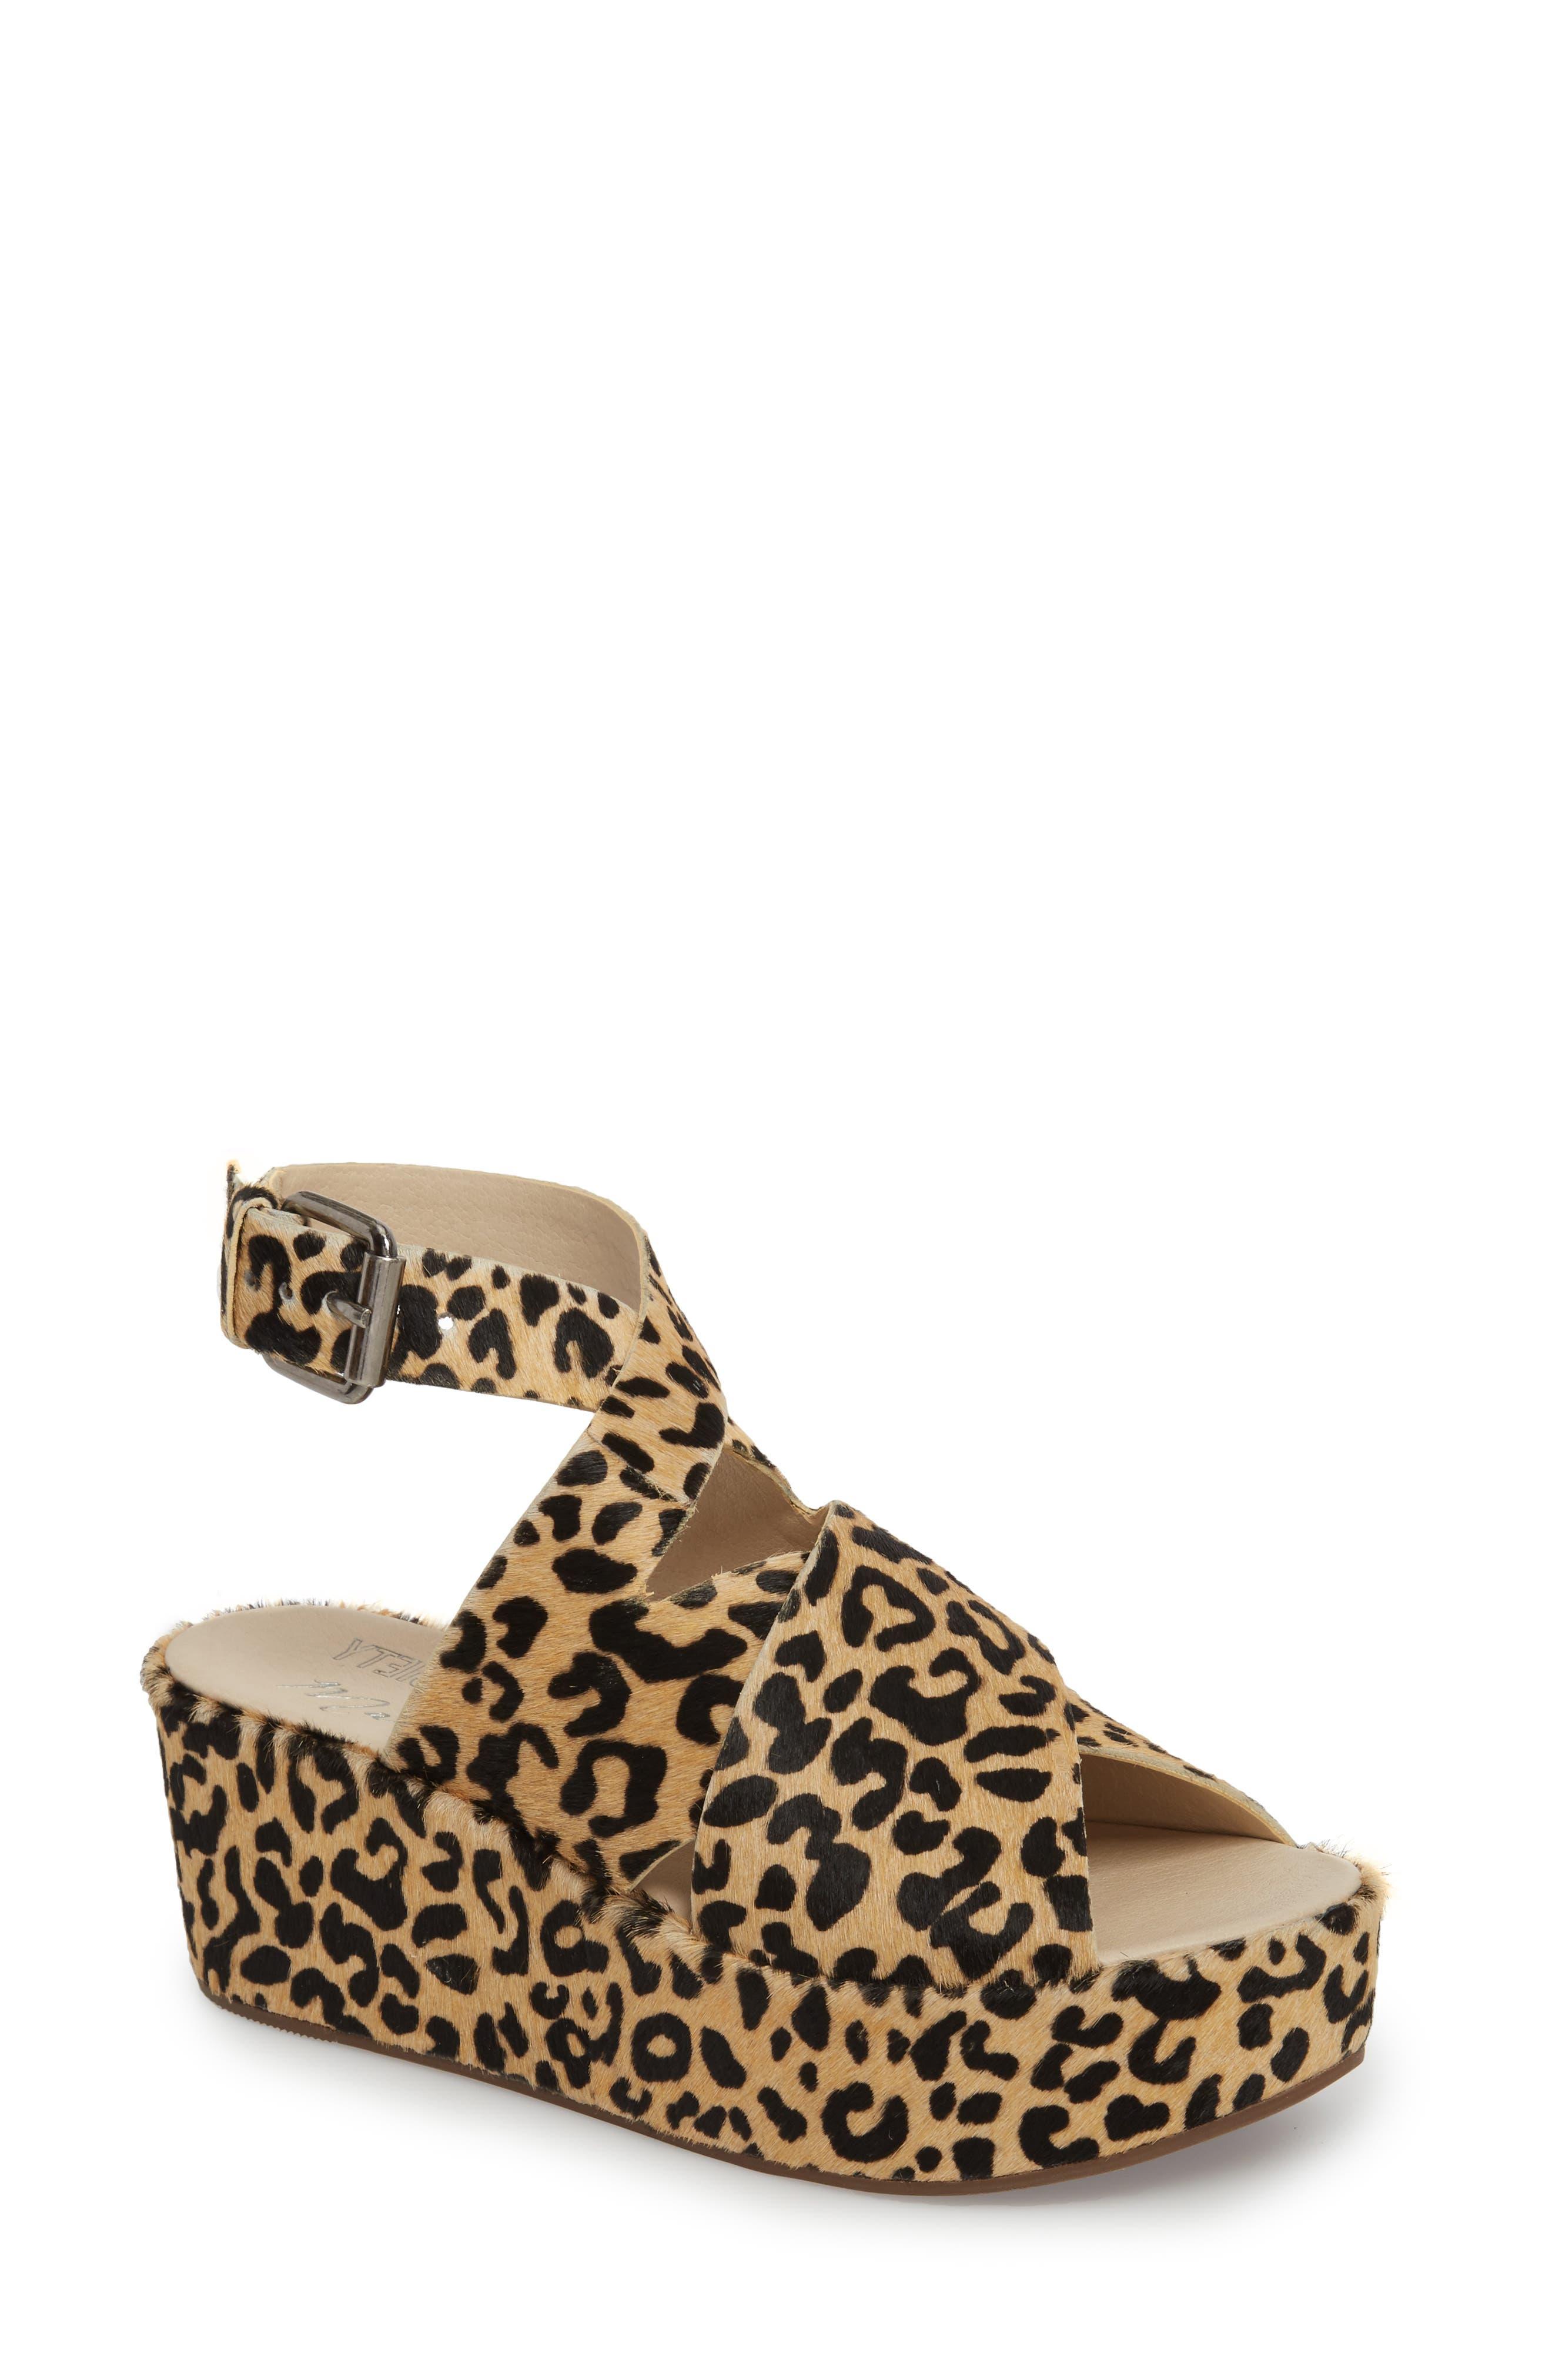 Runway Wedge Sandal,                         Main,                         color, Leopard Calf Hair